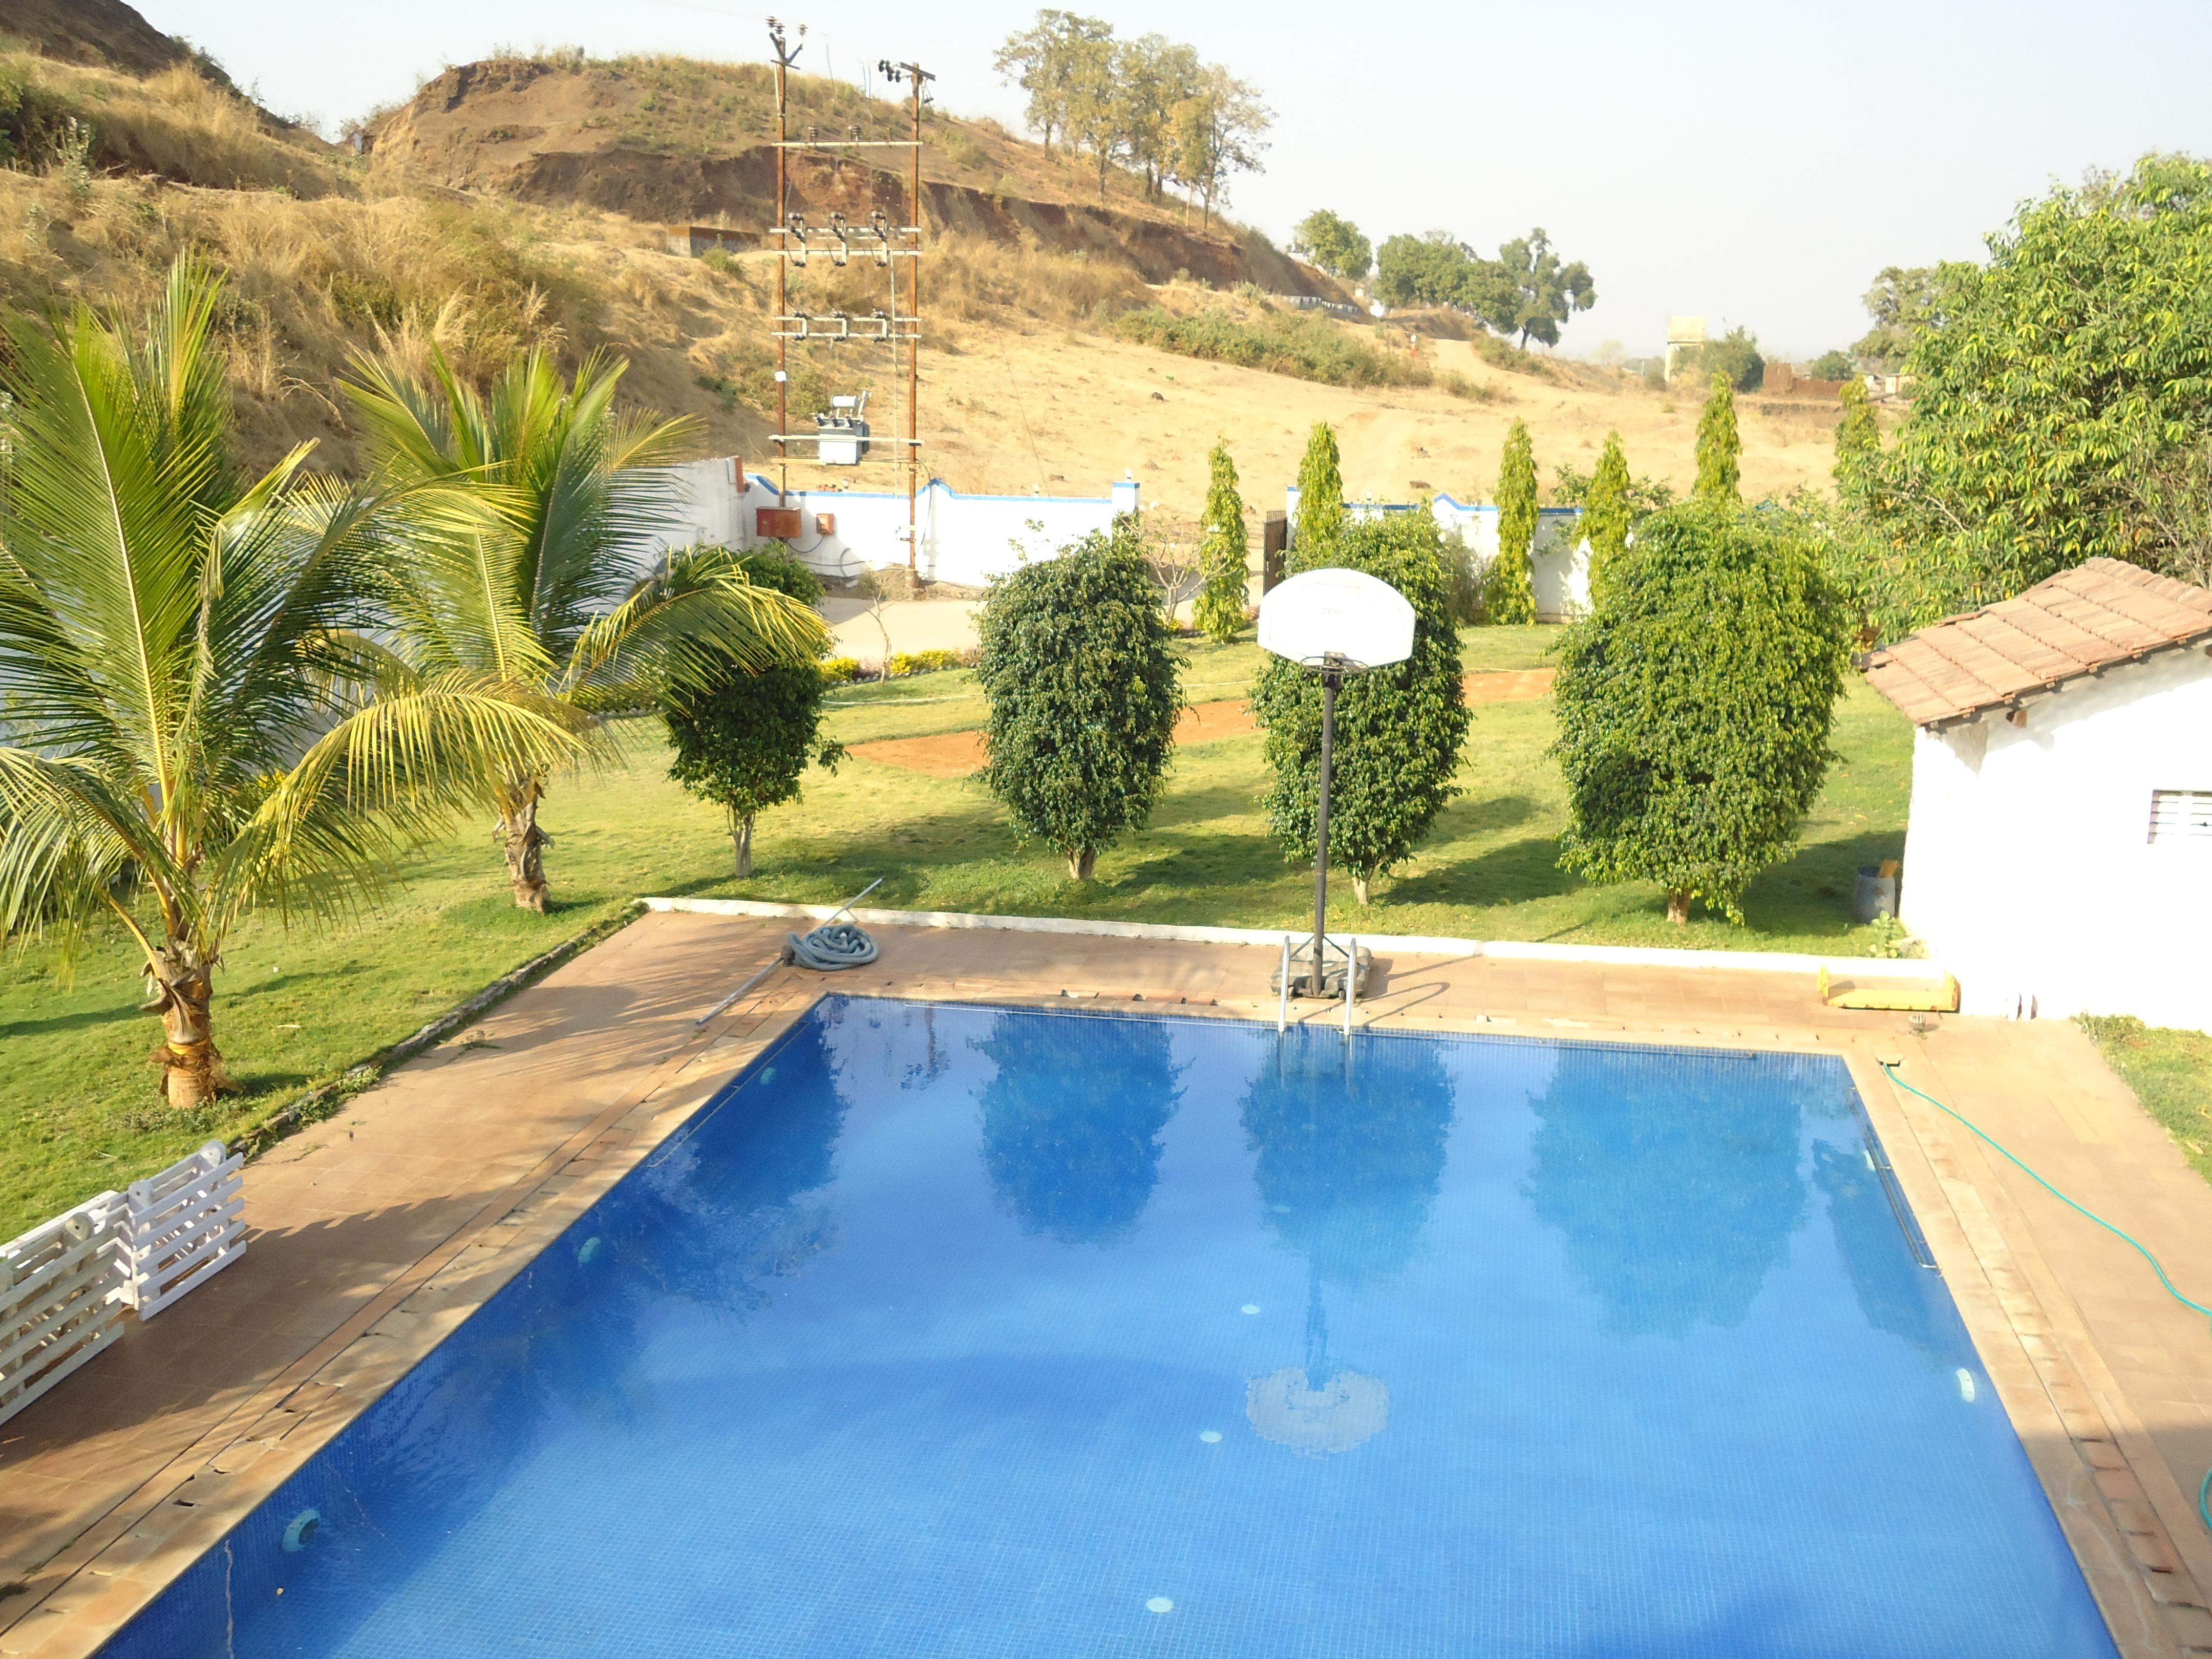 File Swimming Pool In Karjatvilla Farmhouse Jpg Wikimedia Commons